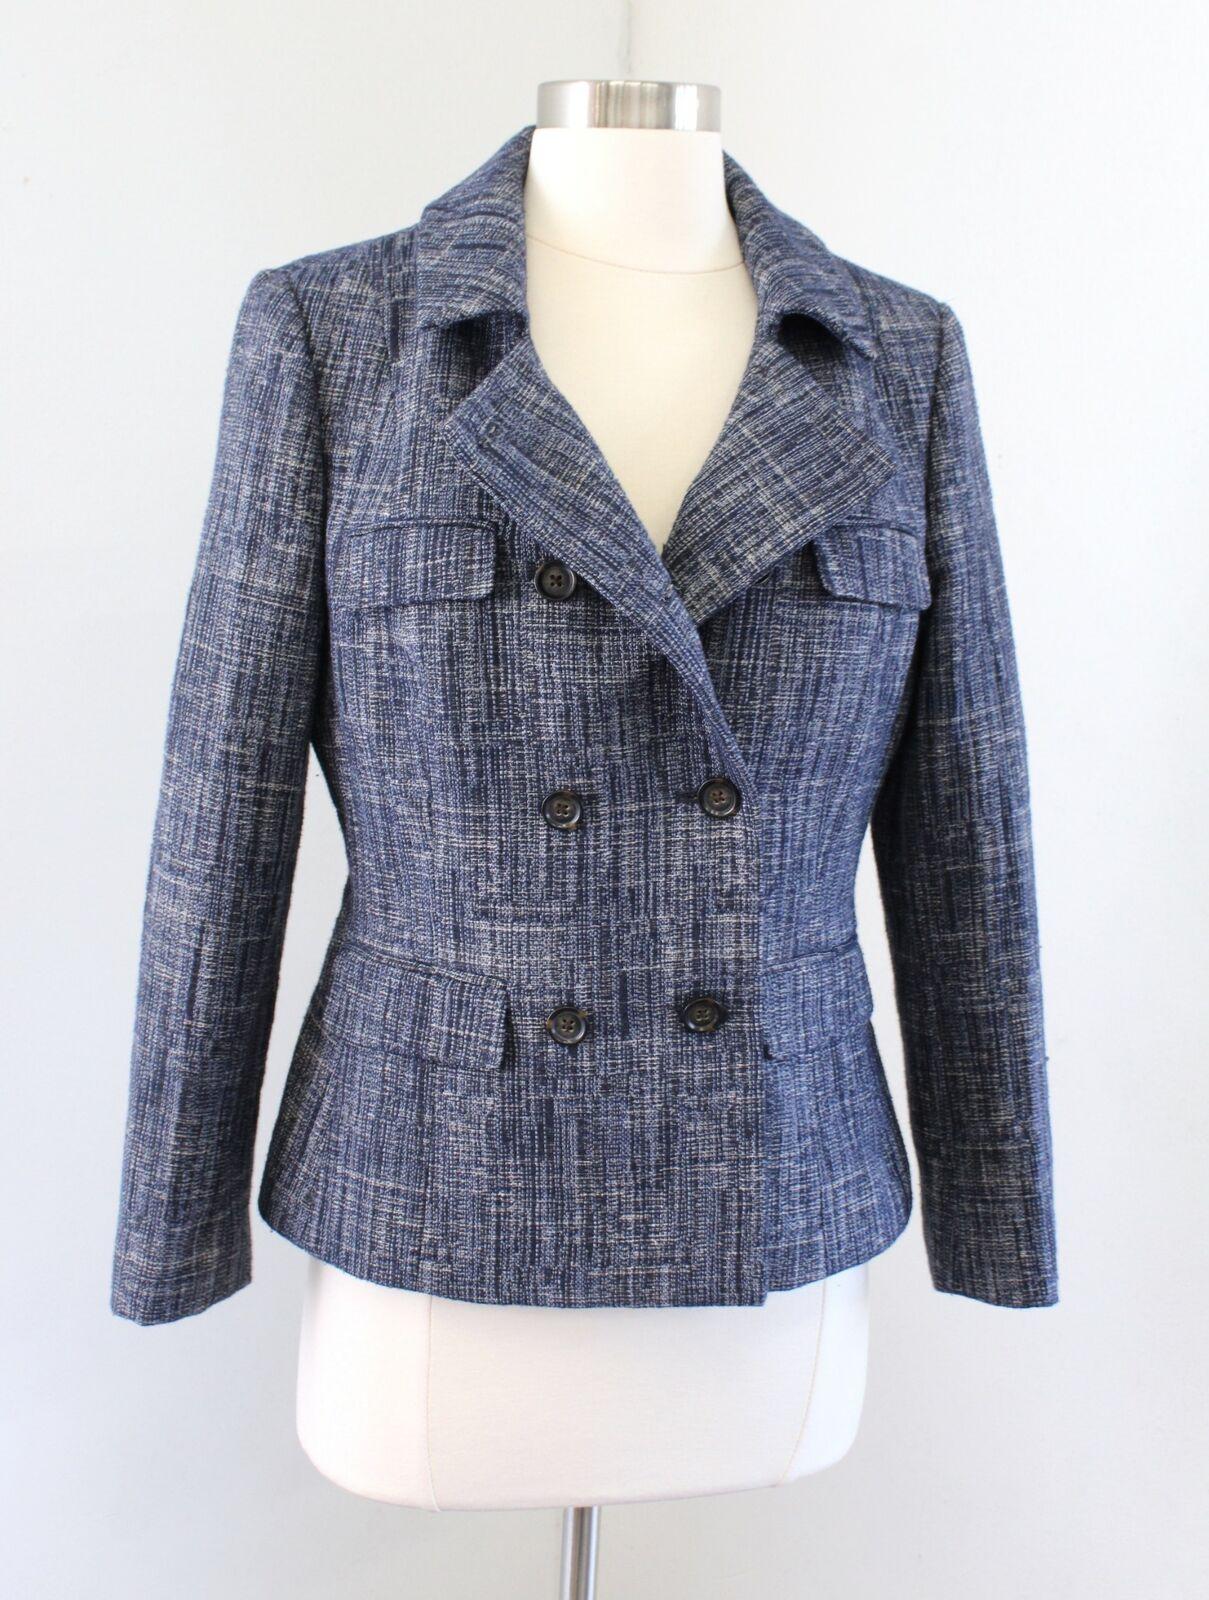 Banana Republic Navy Blue White Tweed Double Breasted Blazer Jacket Size 8 Linen